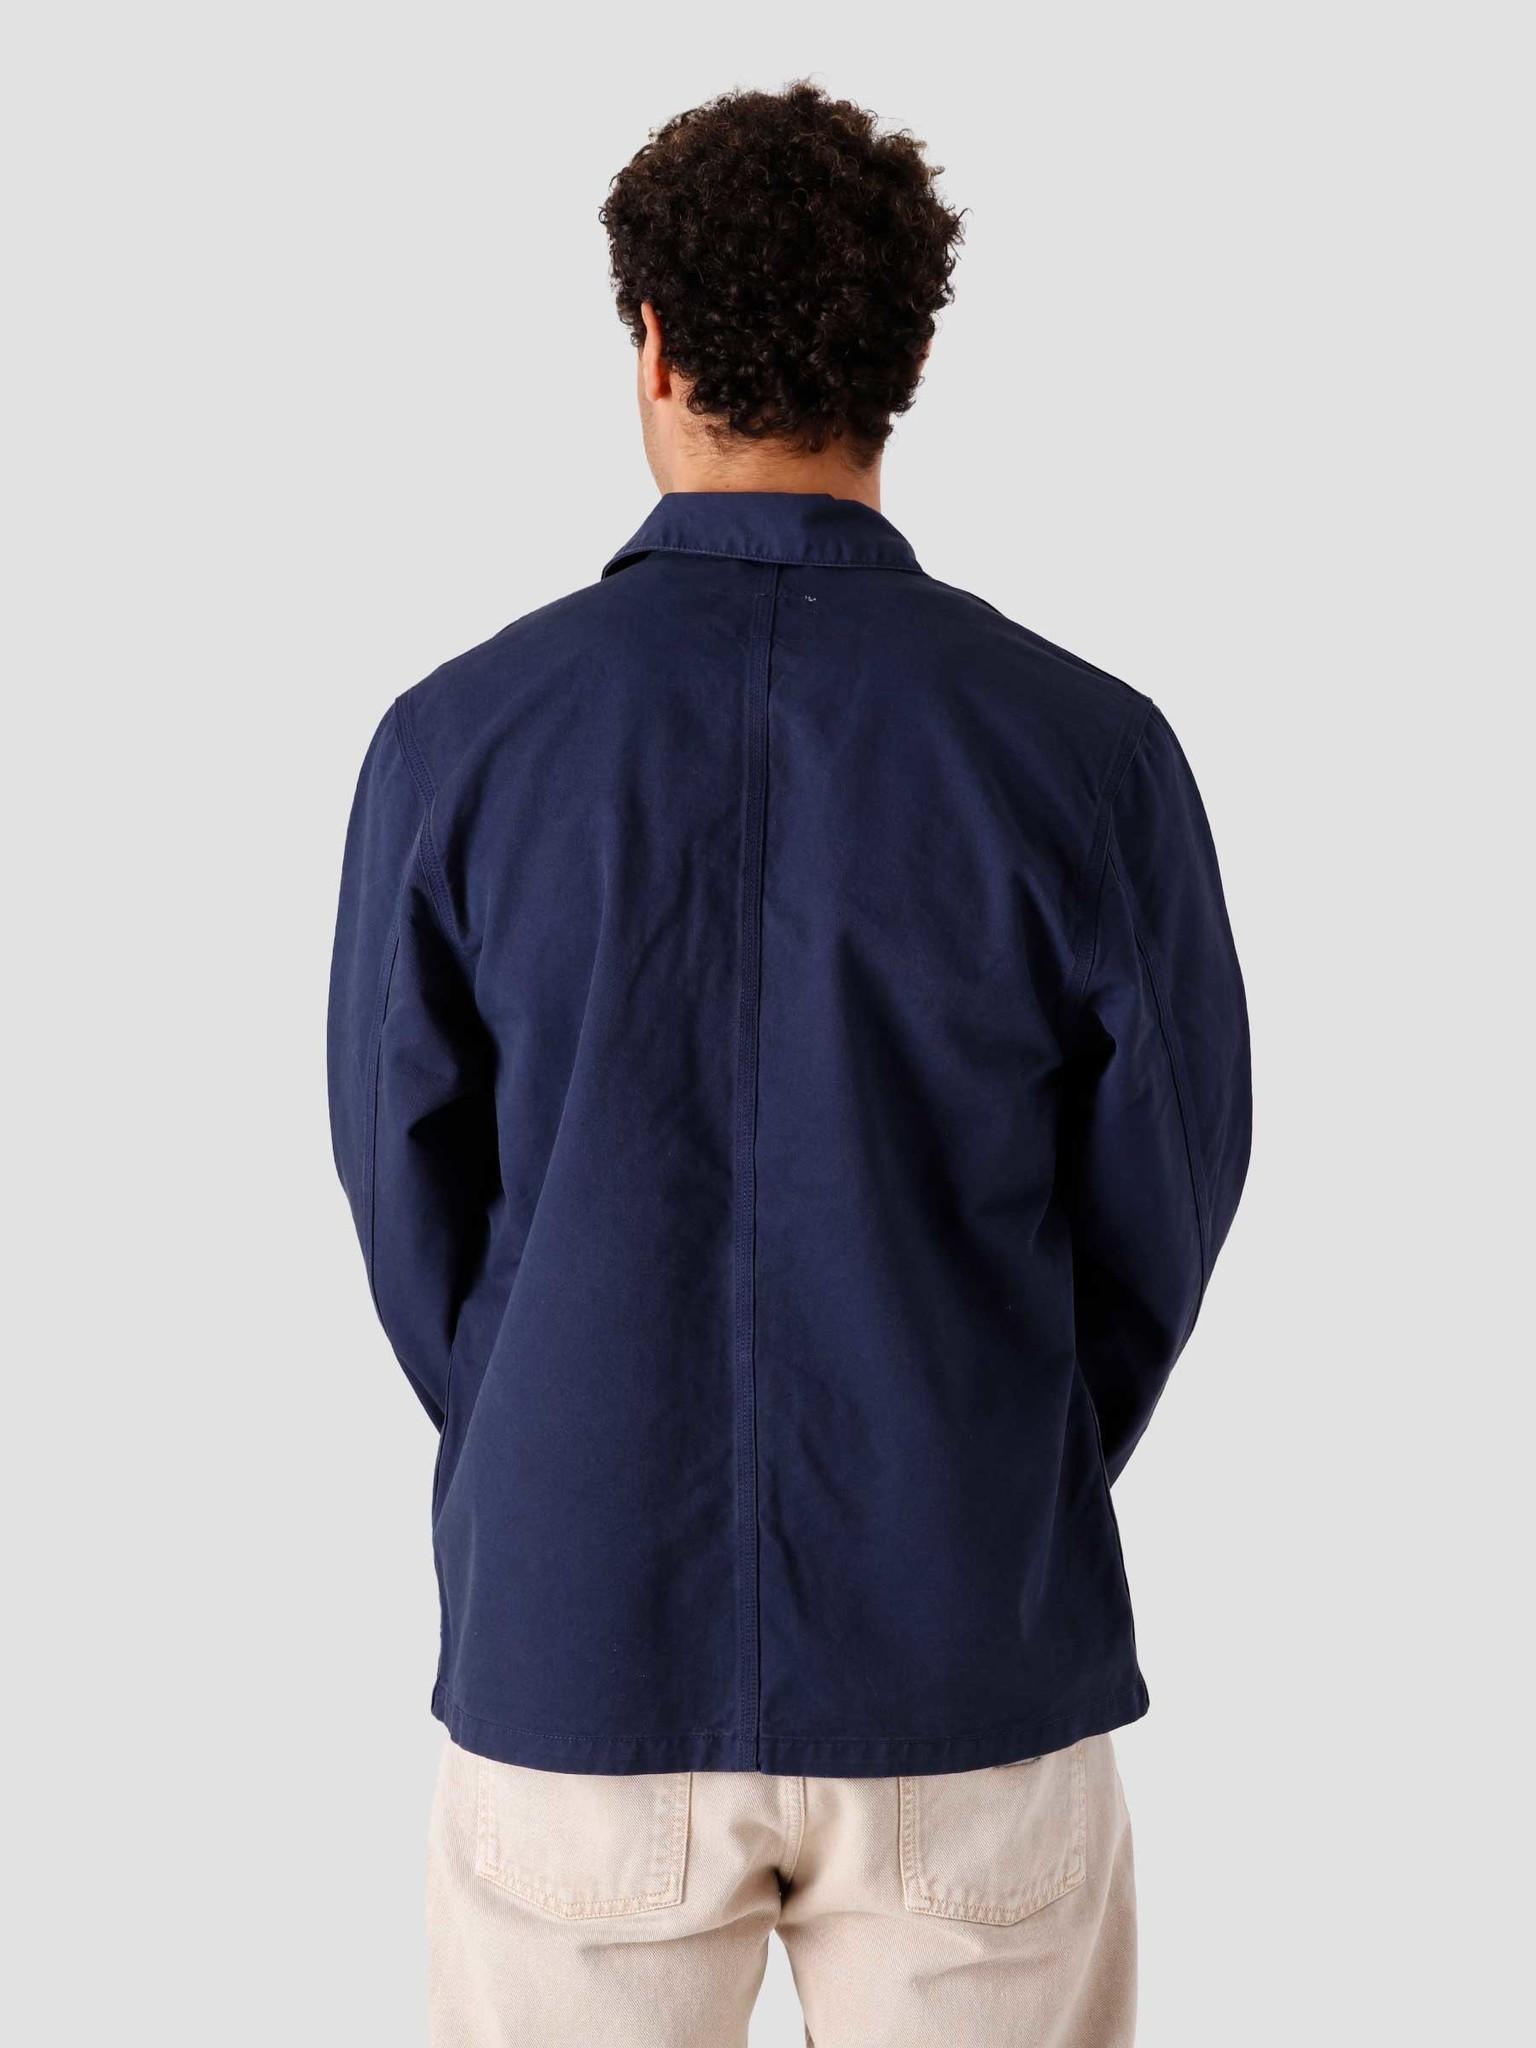 Carhartt WIP Carhartt WIP Michigan Coat Blue I024849-01GD